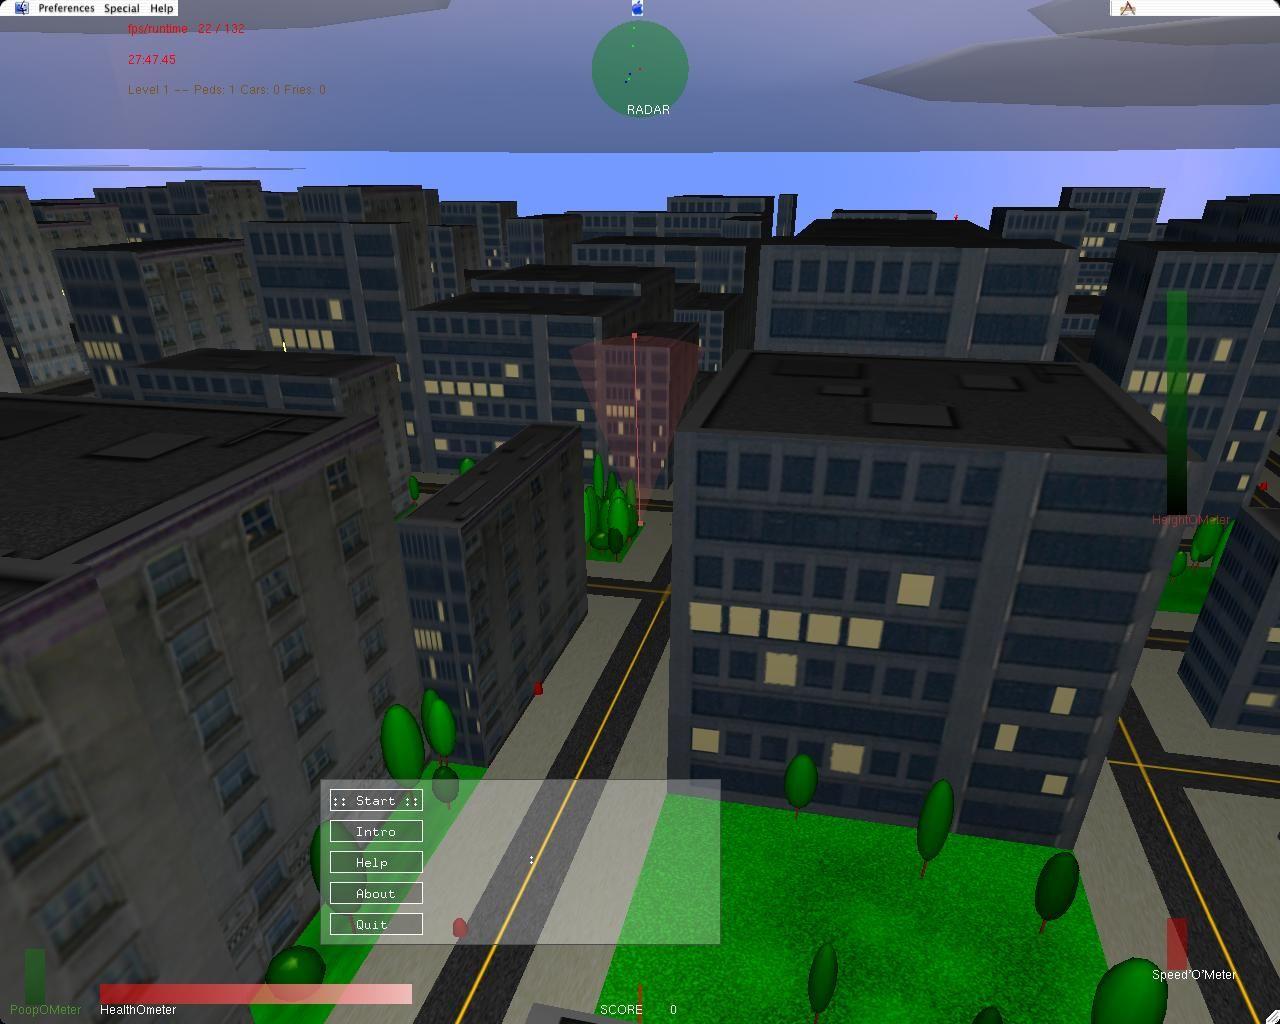 PoopmUp is an open source arcadestyle 3D flight simulator.